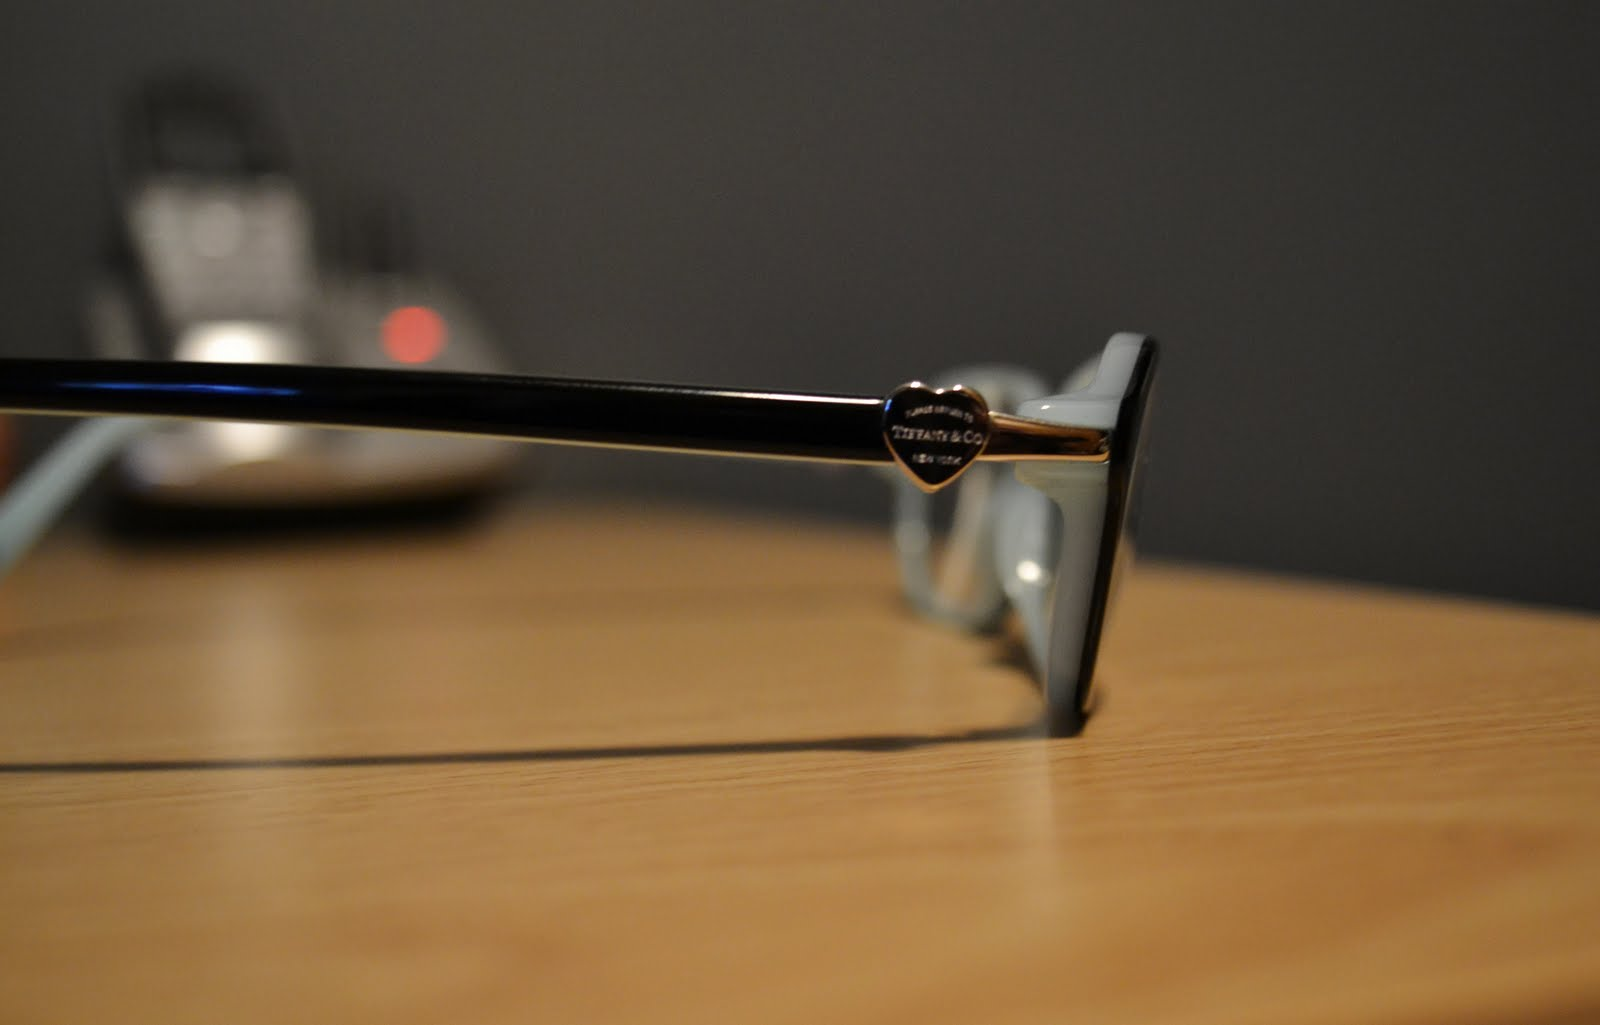 Can I Still Box Even Though I Wear Glasses